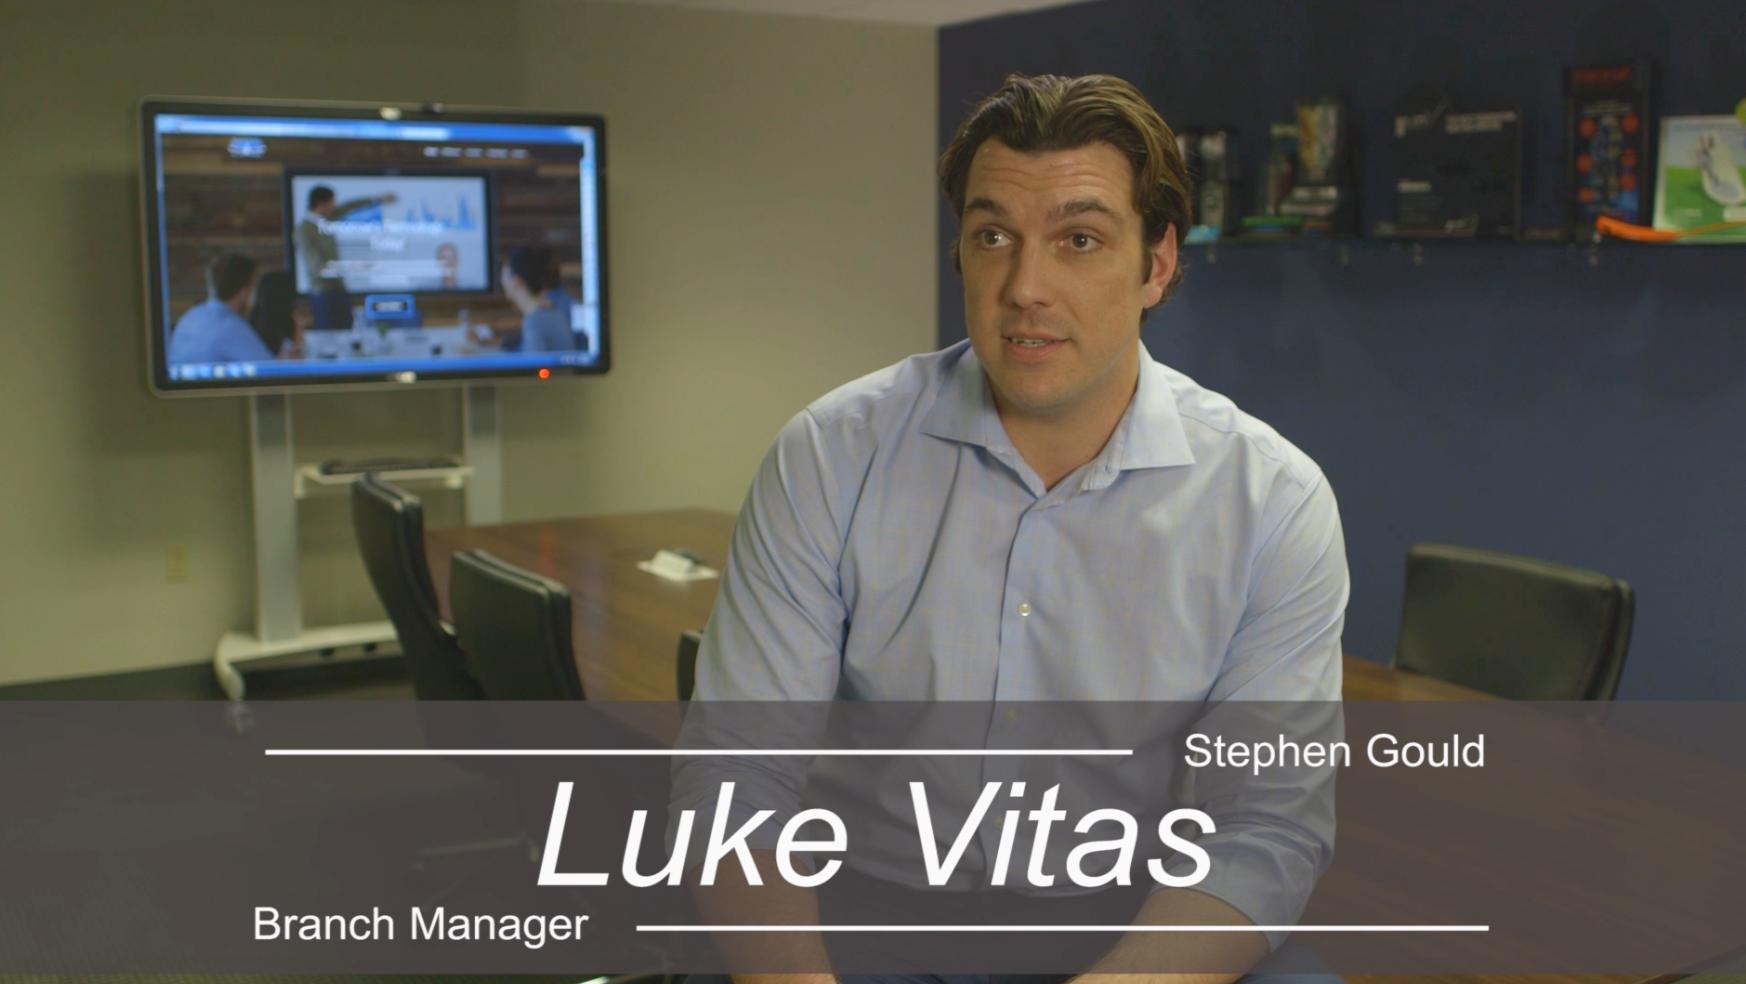 Customer Testimony Luke Vitas, Branch Manager at Stephen Gould